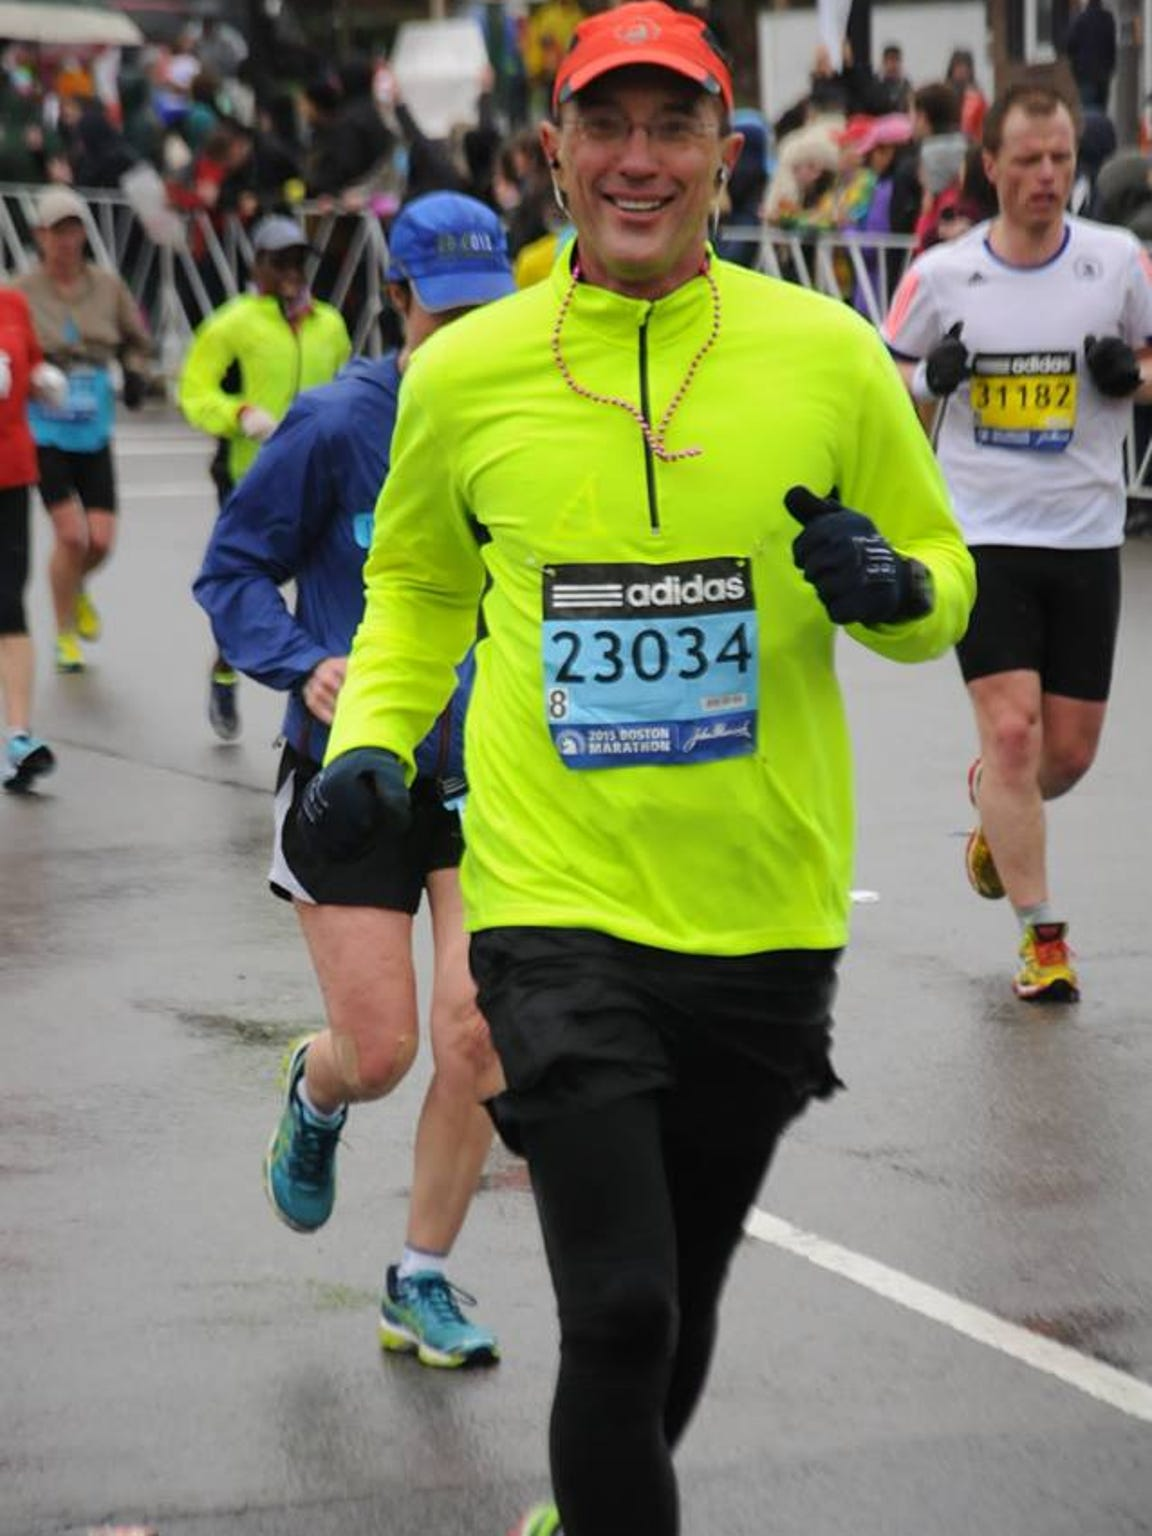 Steven Heithoff completes the Boston Marathon.